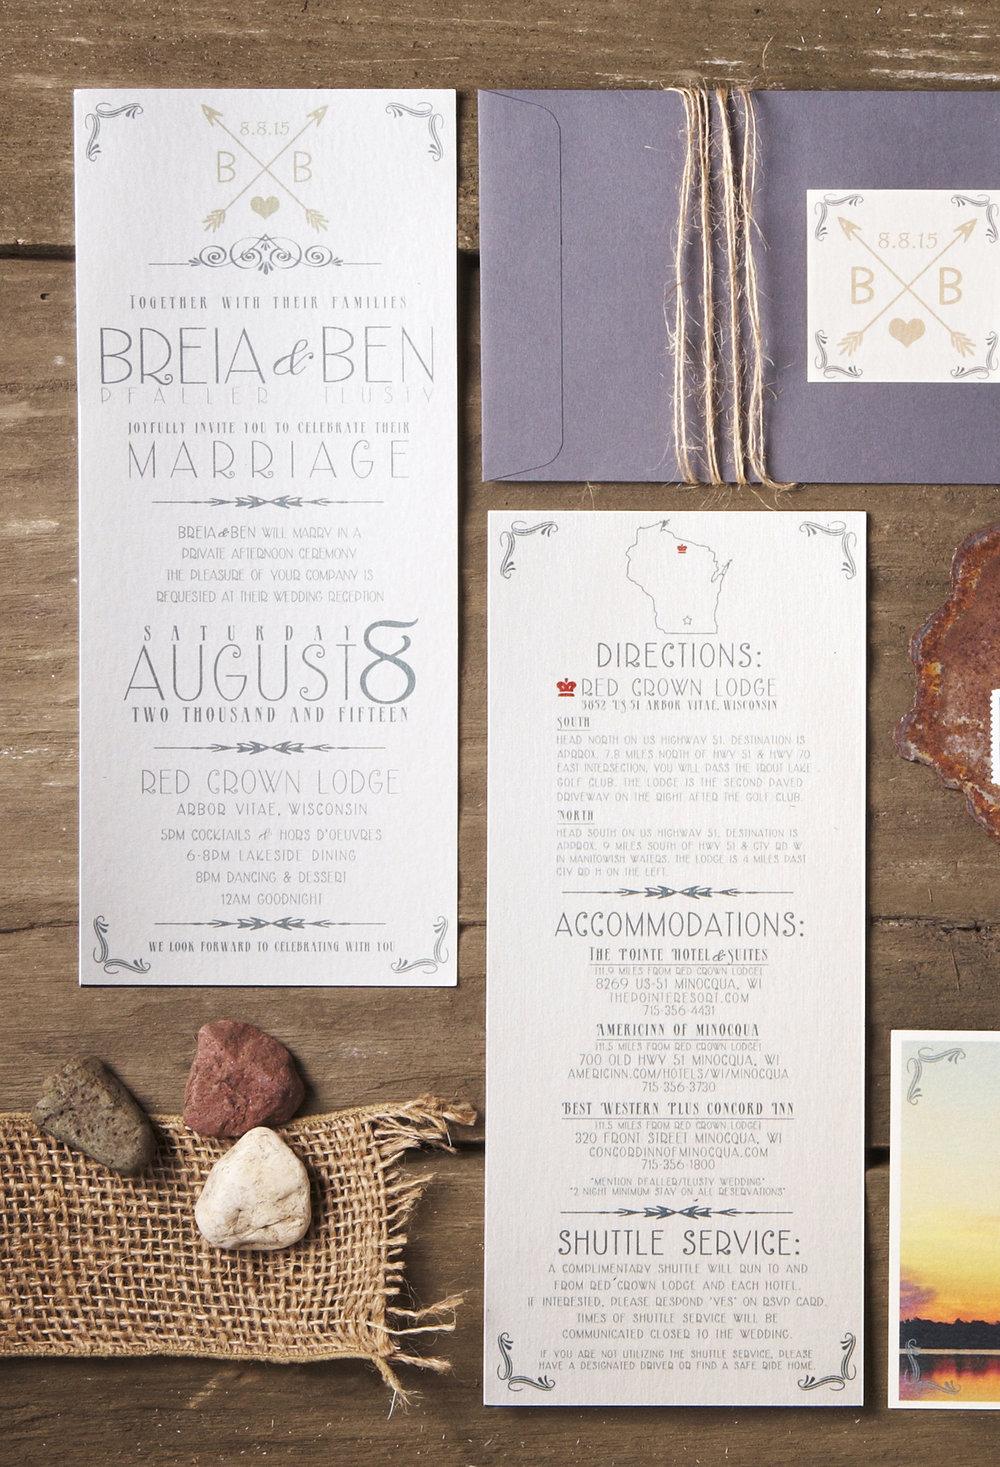 Breia_custom_wedding_invitation_huntwrightdesignco_003.jpg